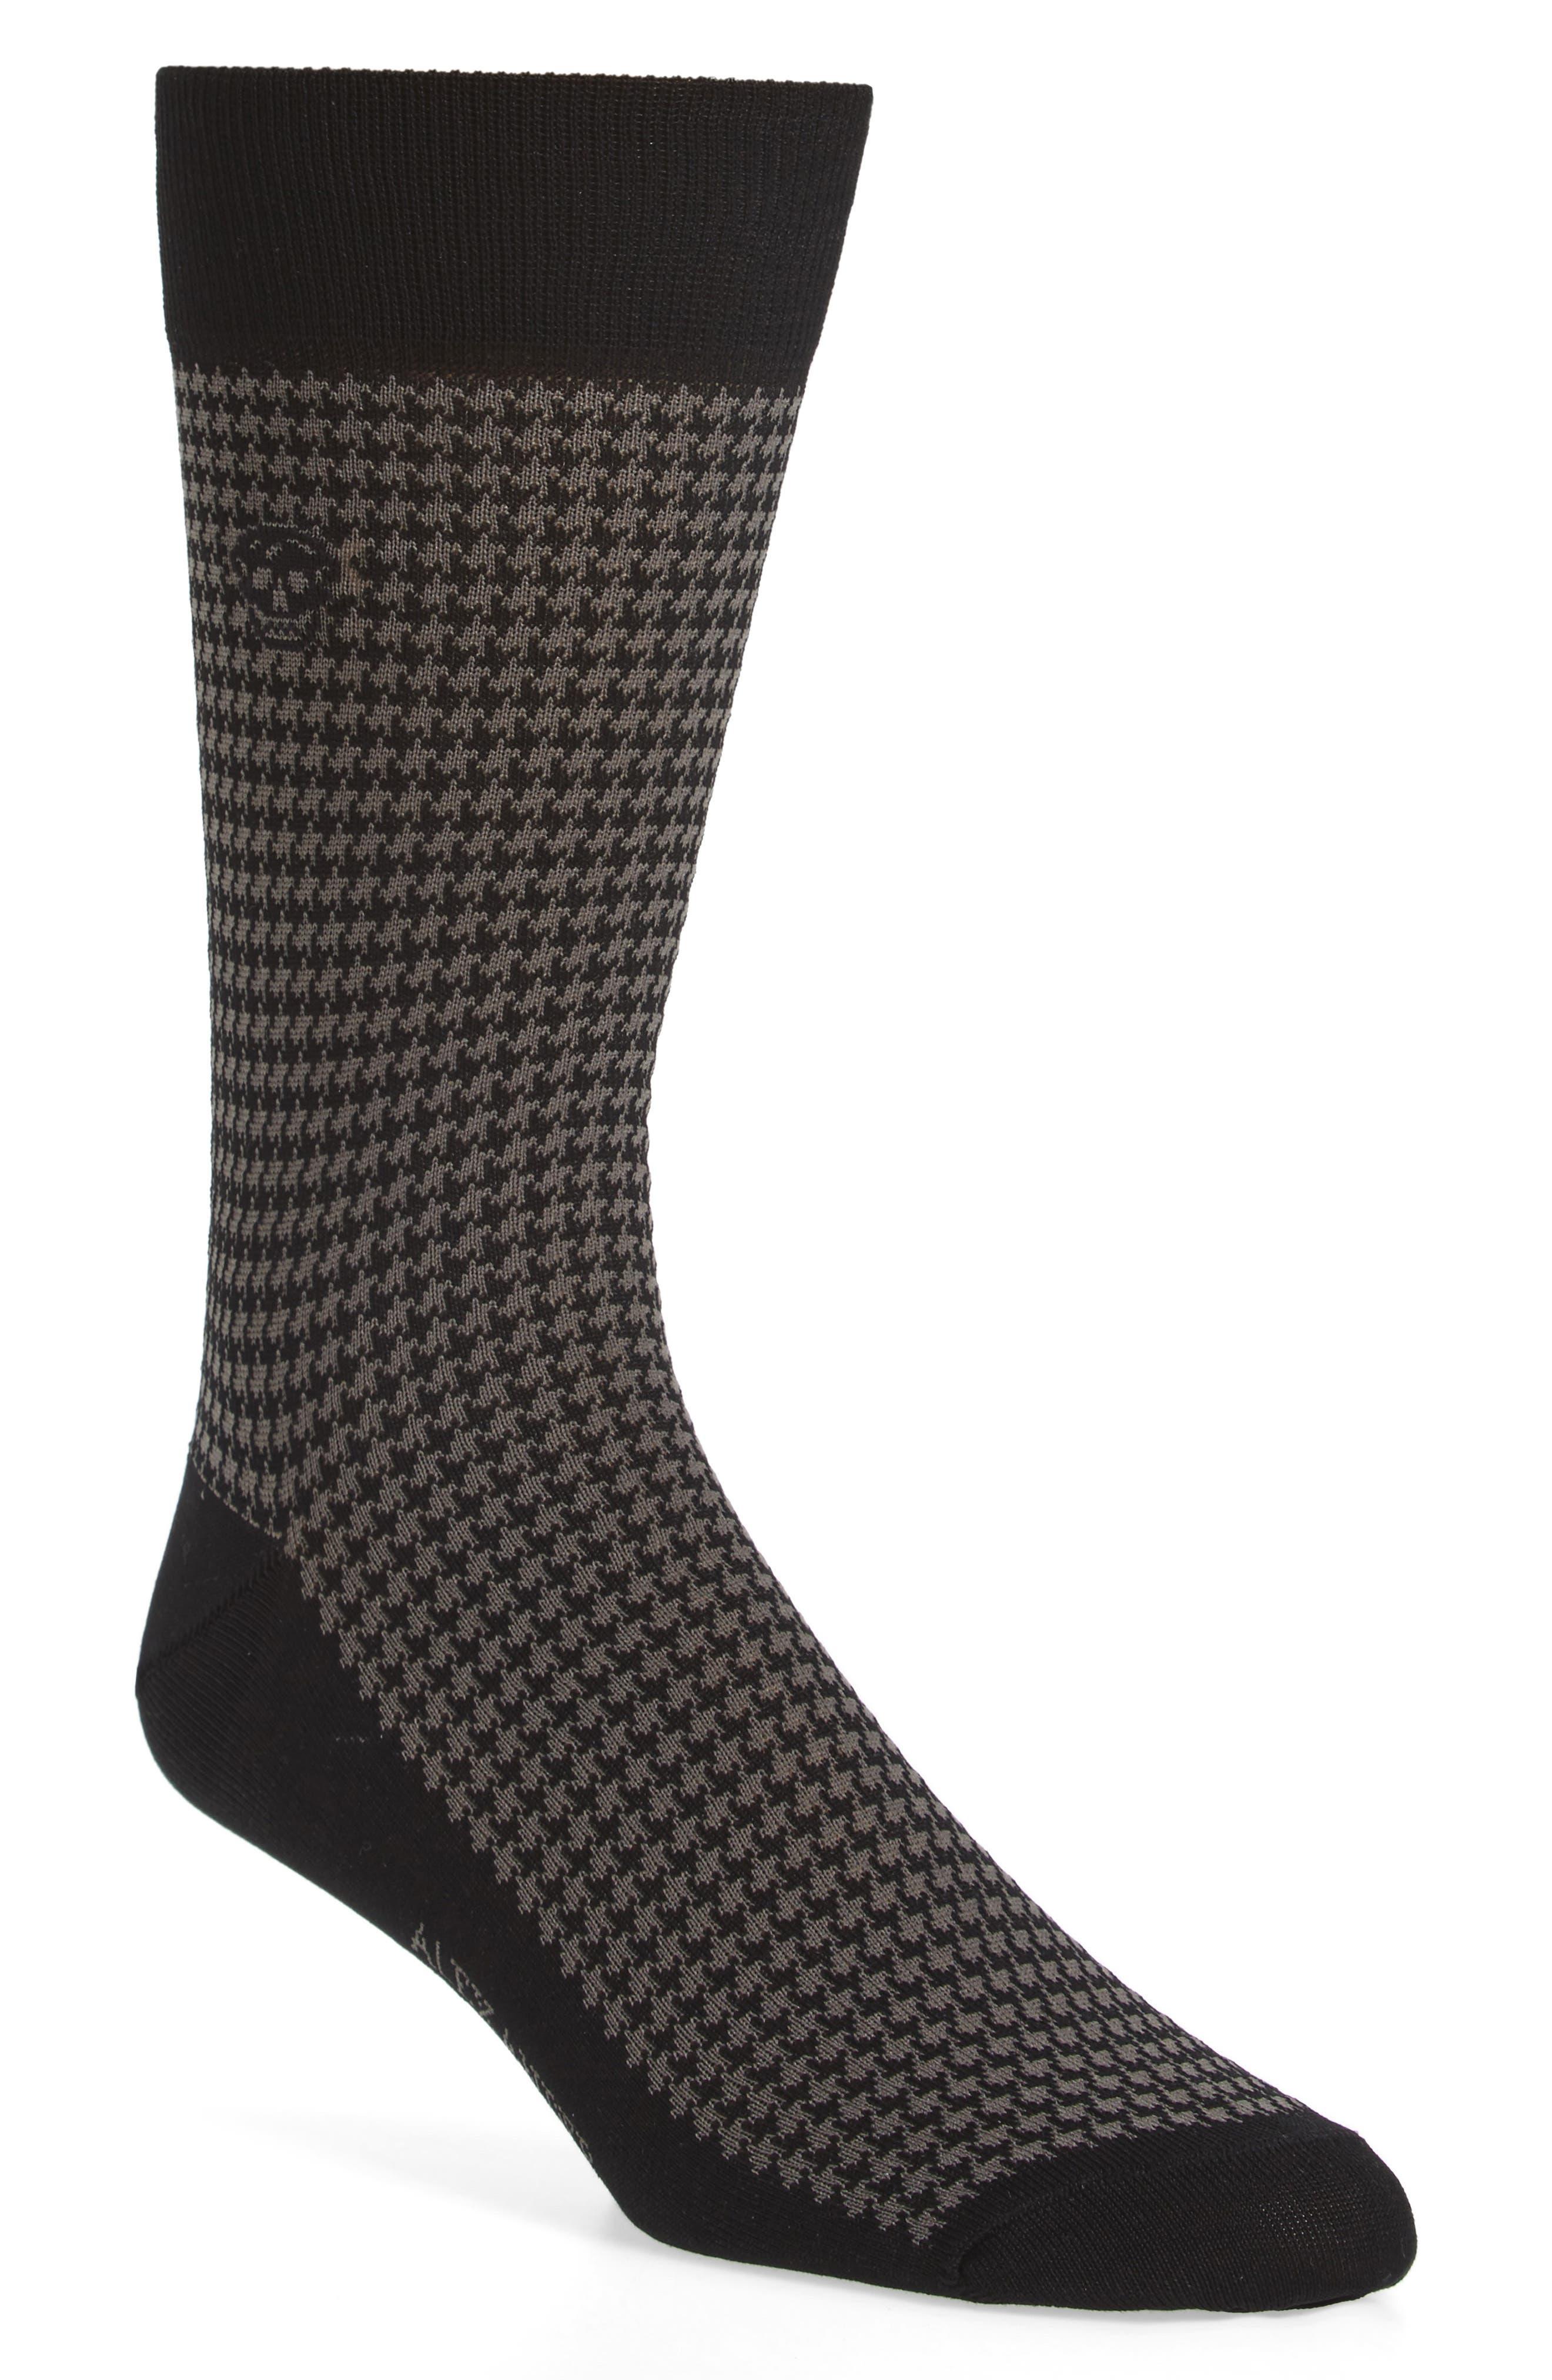 Alexander McQueen Cotton Blend Houndstooth Socks